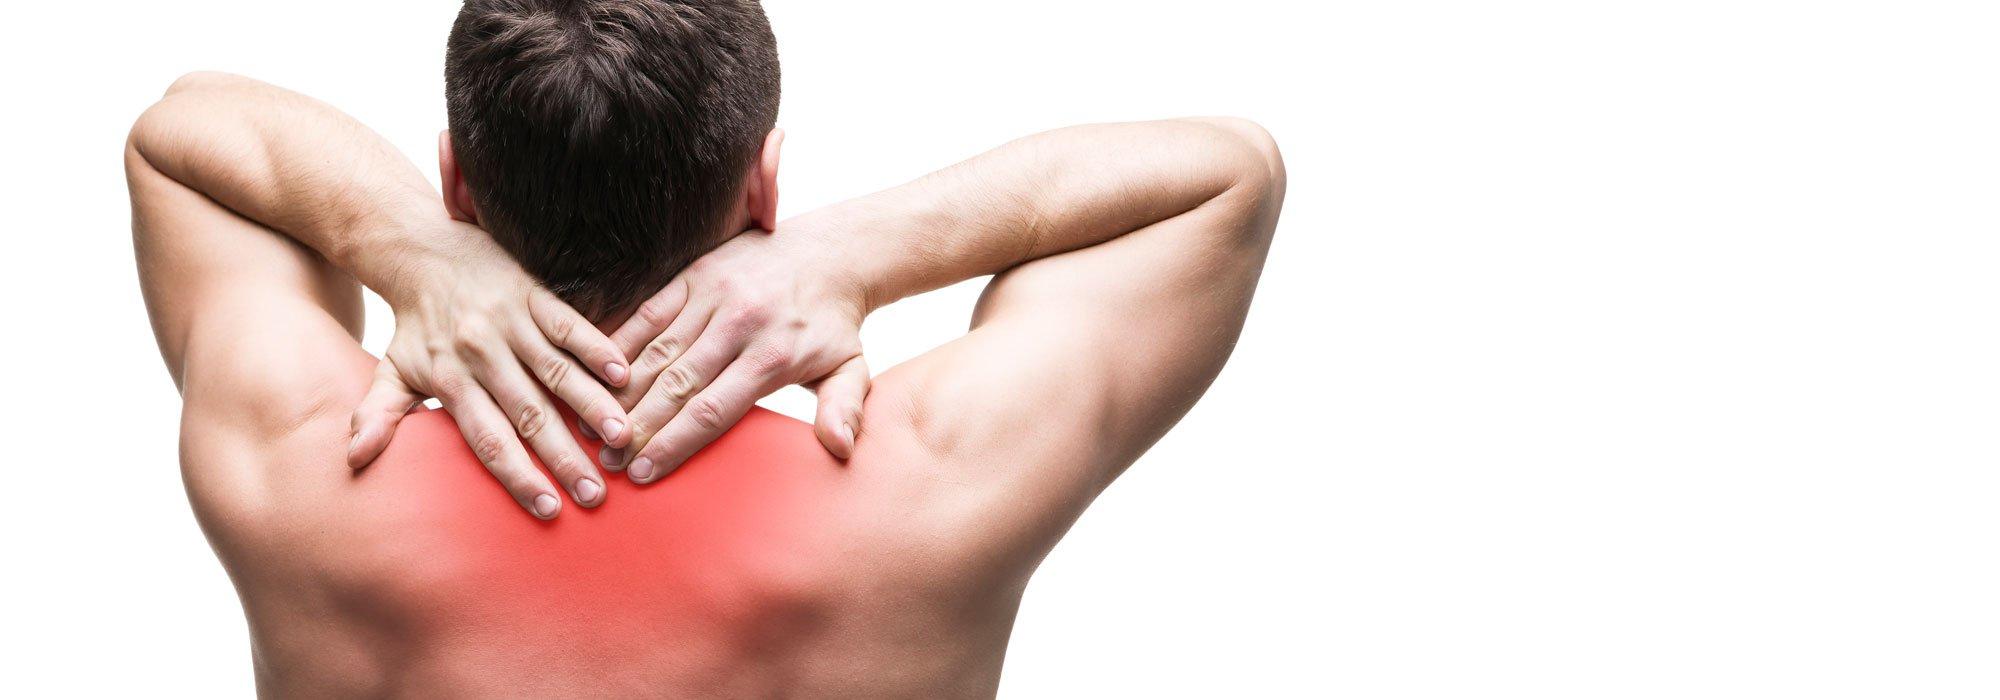 laser pain relief